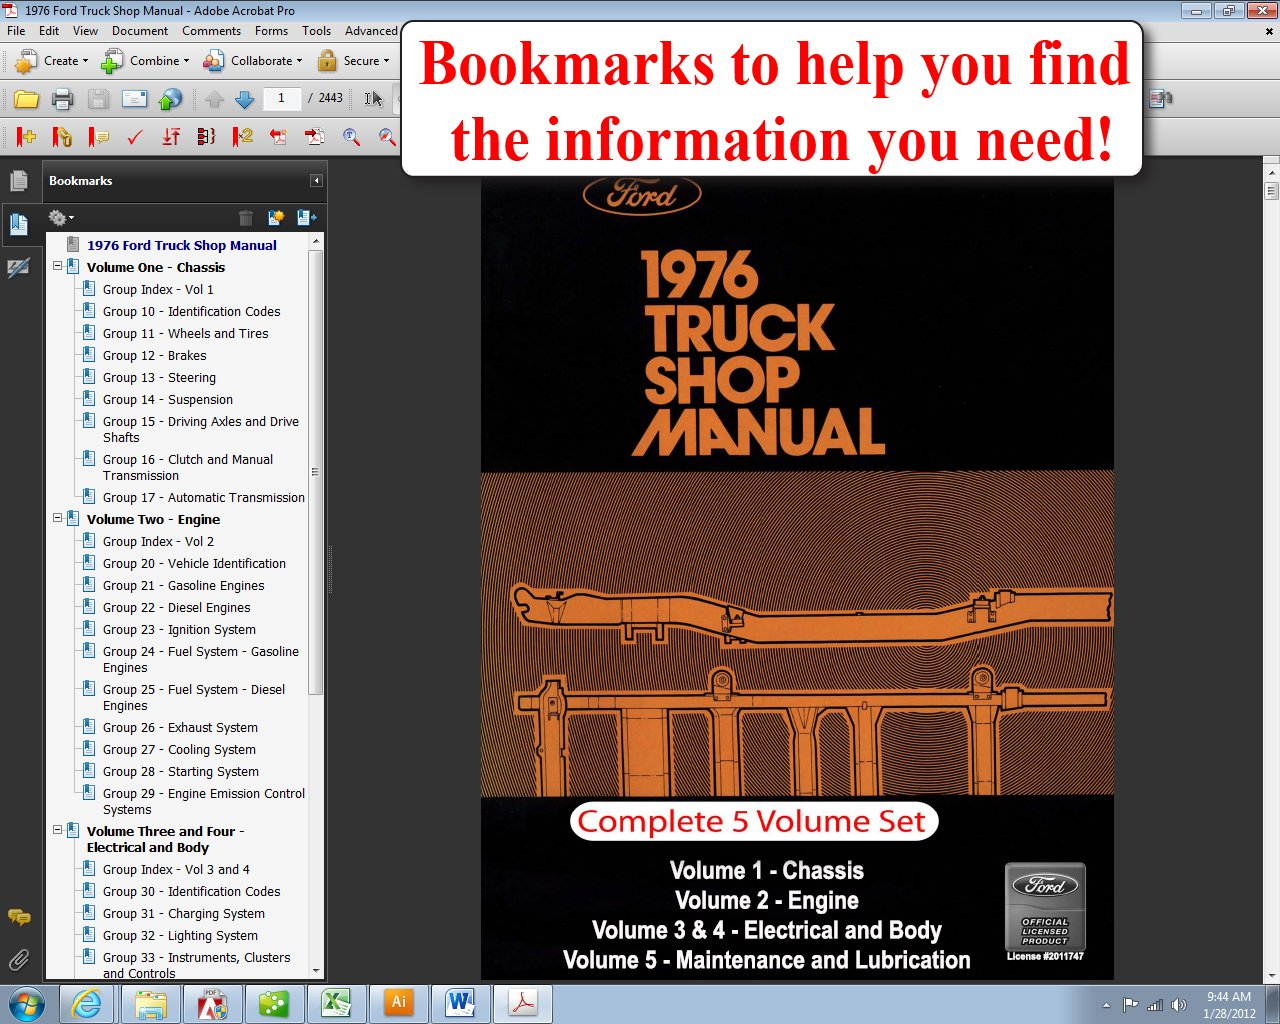 1976 Ford Truck Shop Manual: Ford Motor Company, David E. LeBlanc:  9781603710848: Amazon.com: Books